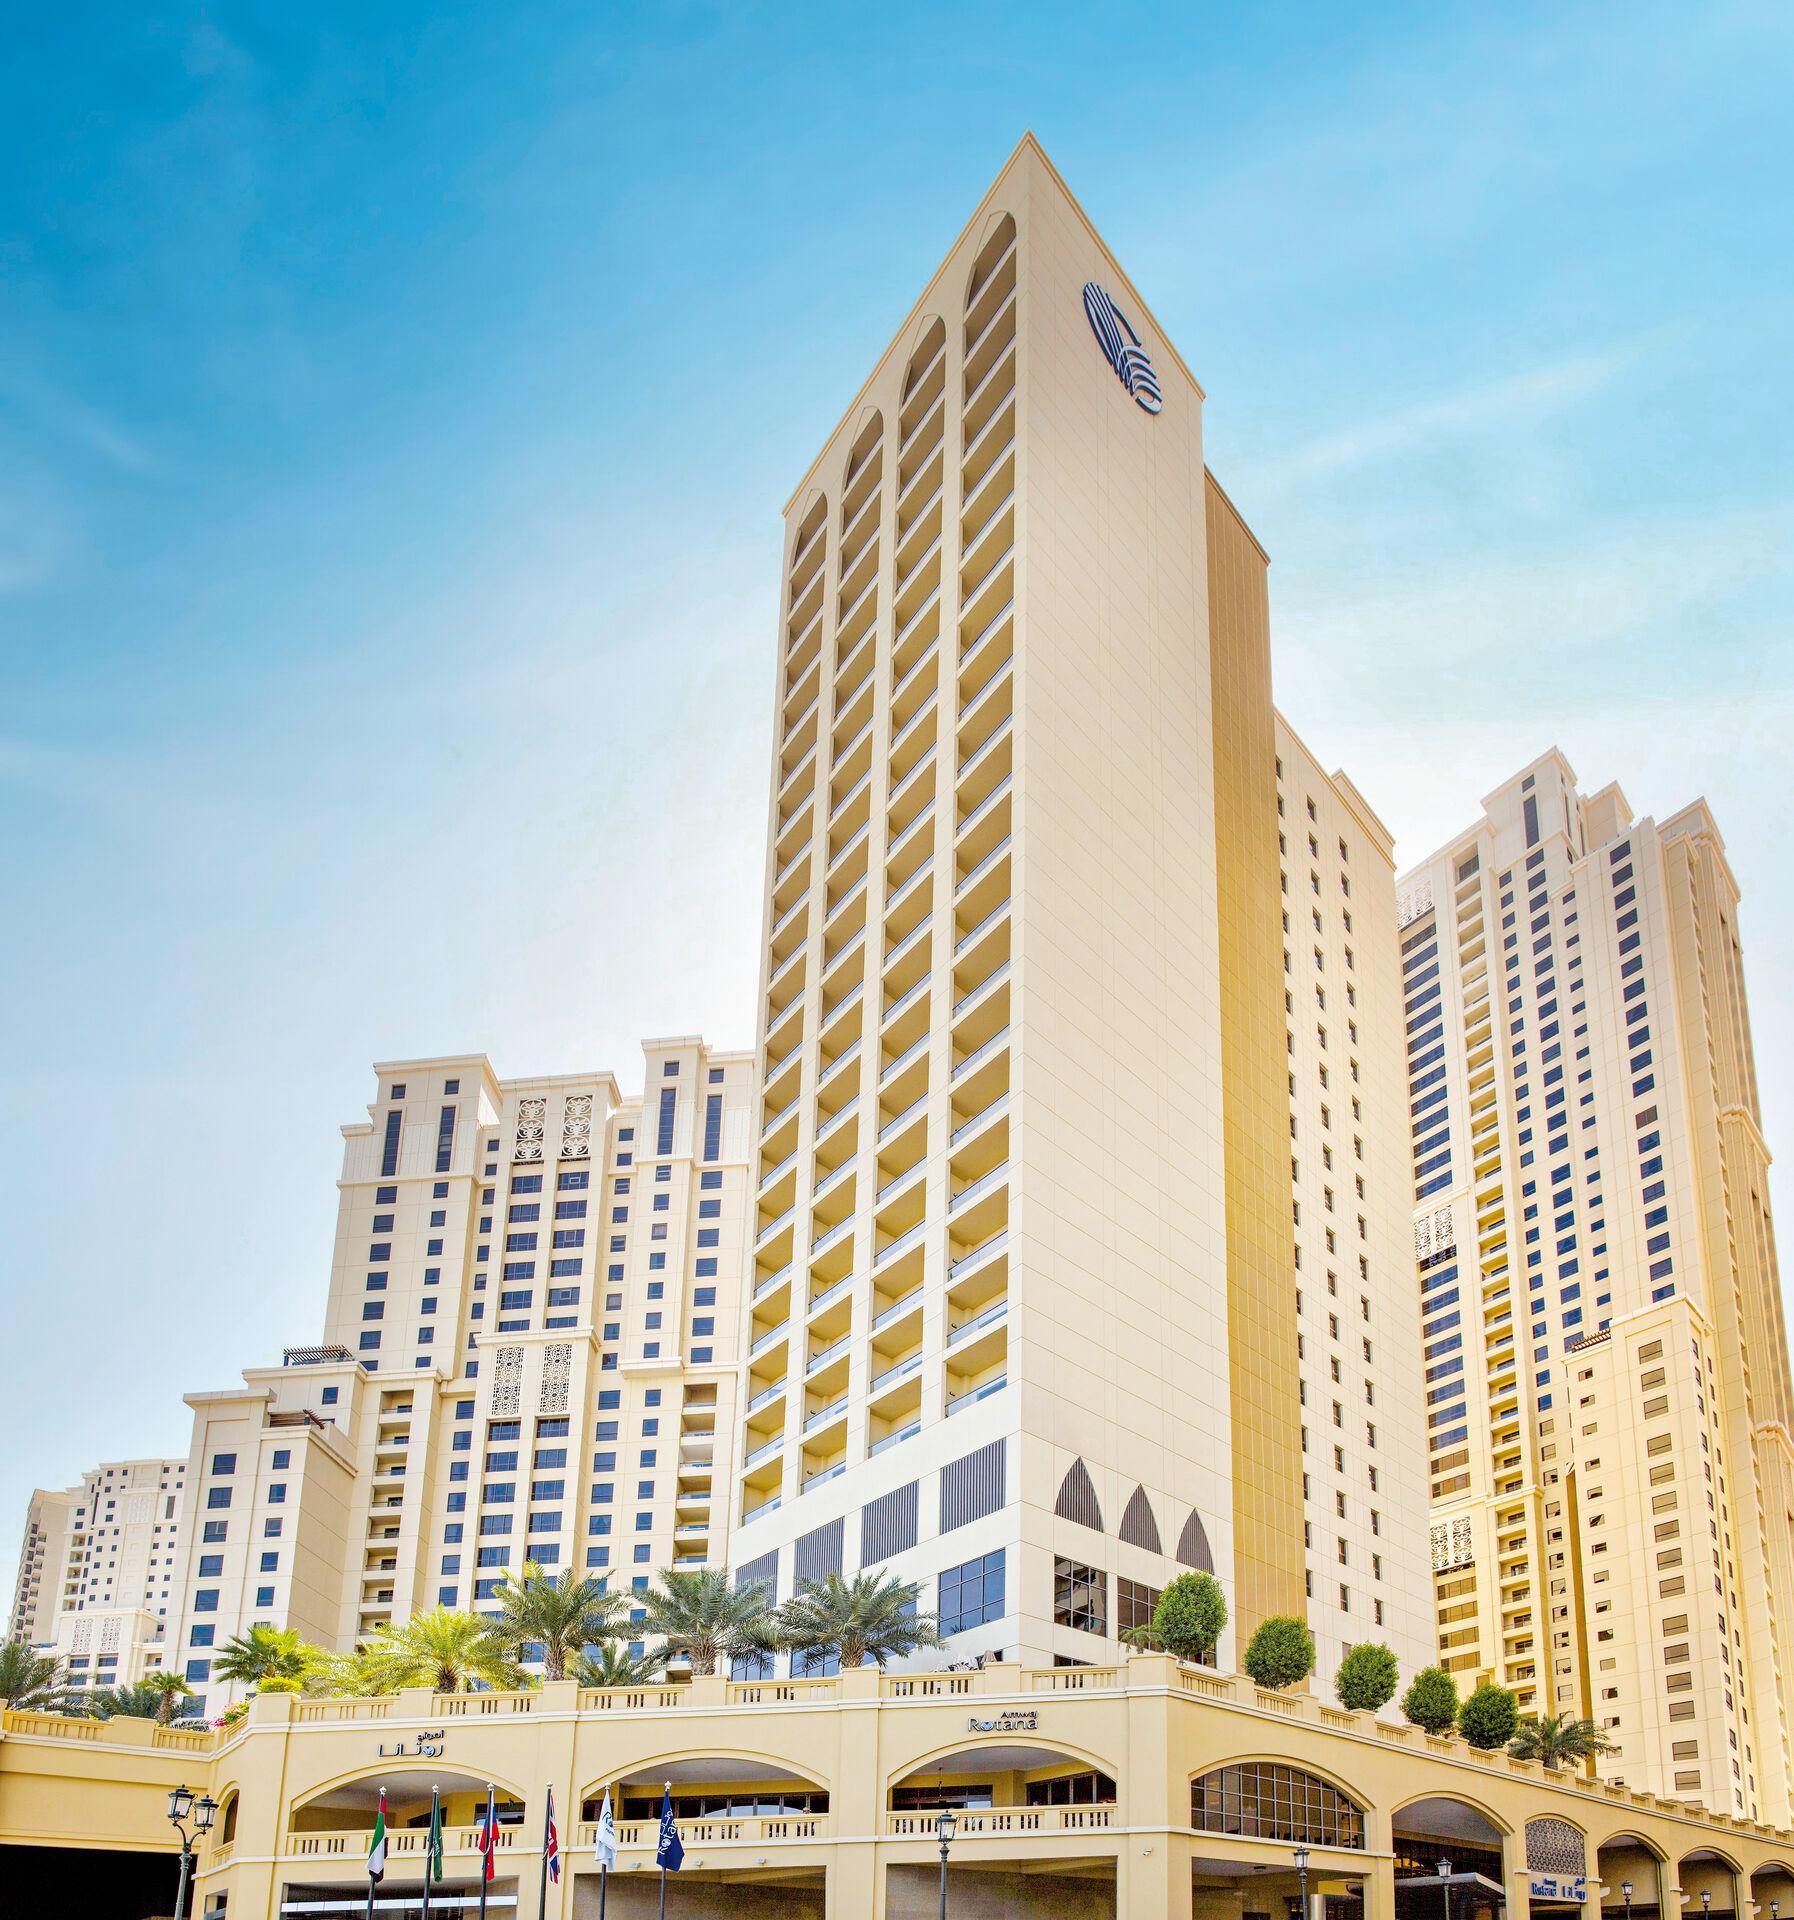 Séjour Emirats Arabes Unis - Amwaj Rotana Hotel - 5*